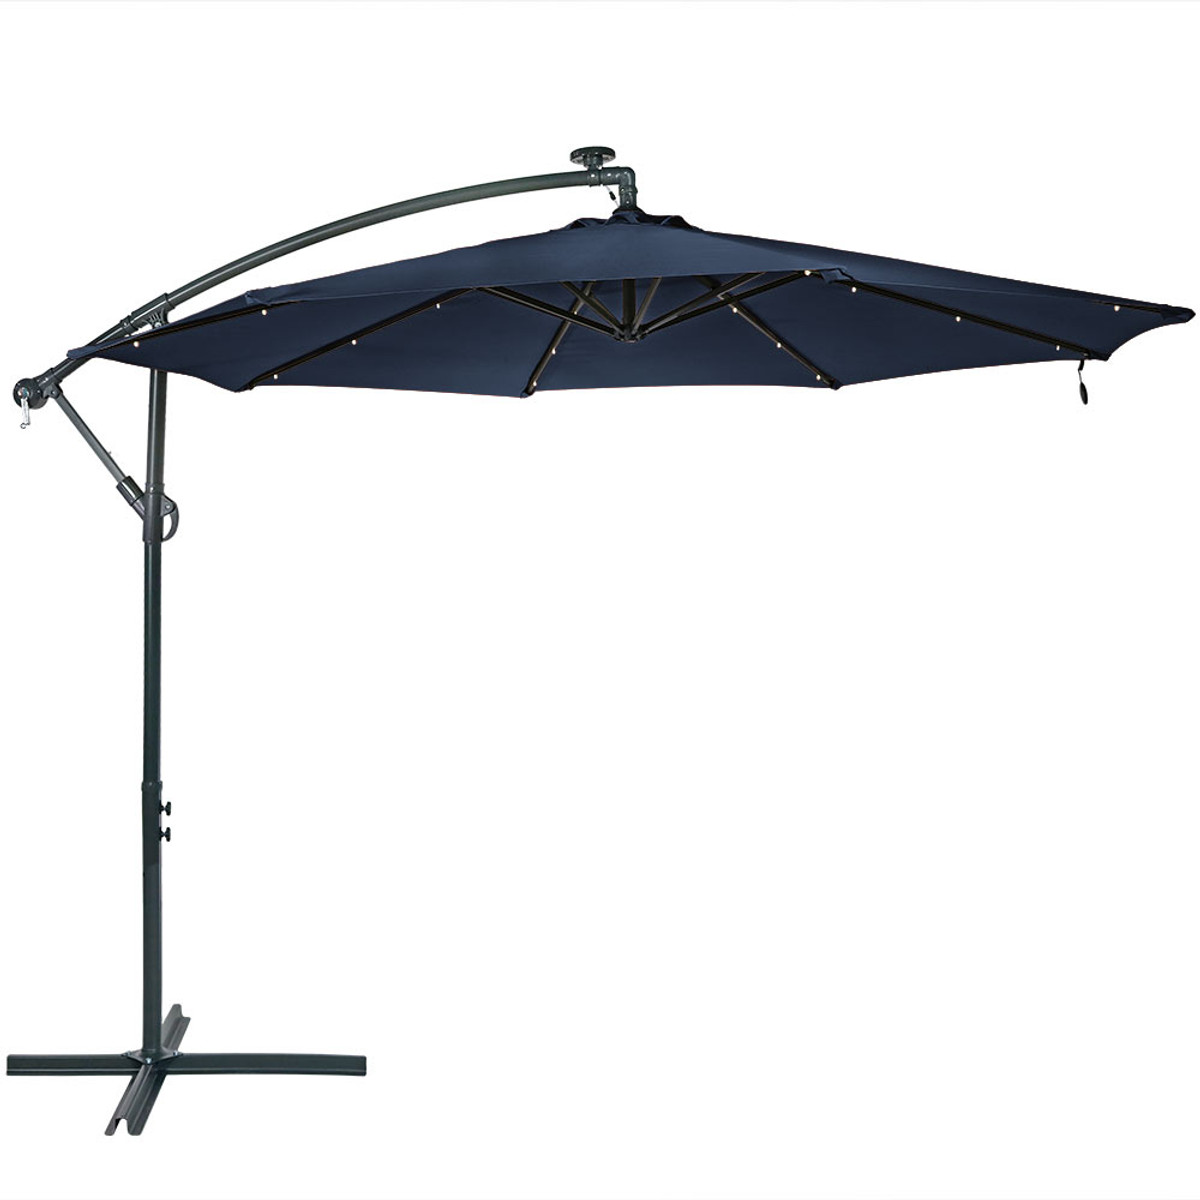 Sunnydaze Solar LED 10 Foot Offset Patio Umbrella With Cantilever, Crank,  And Cross Base